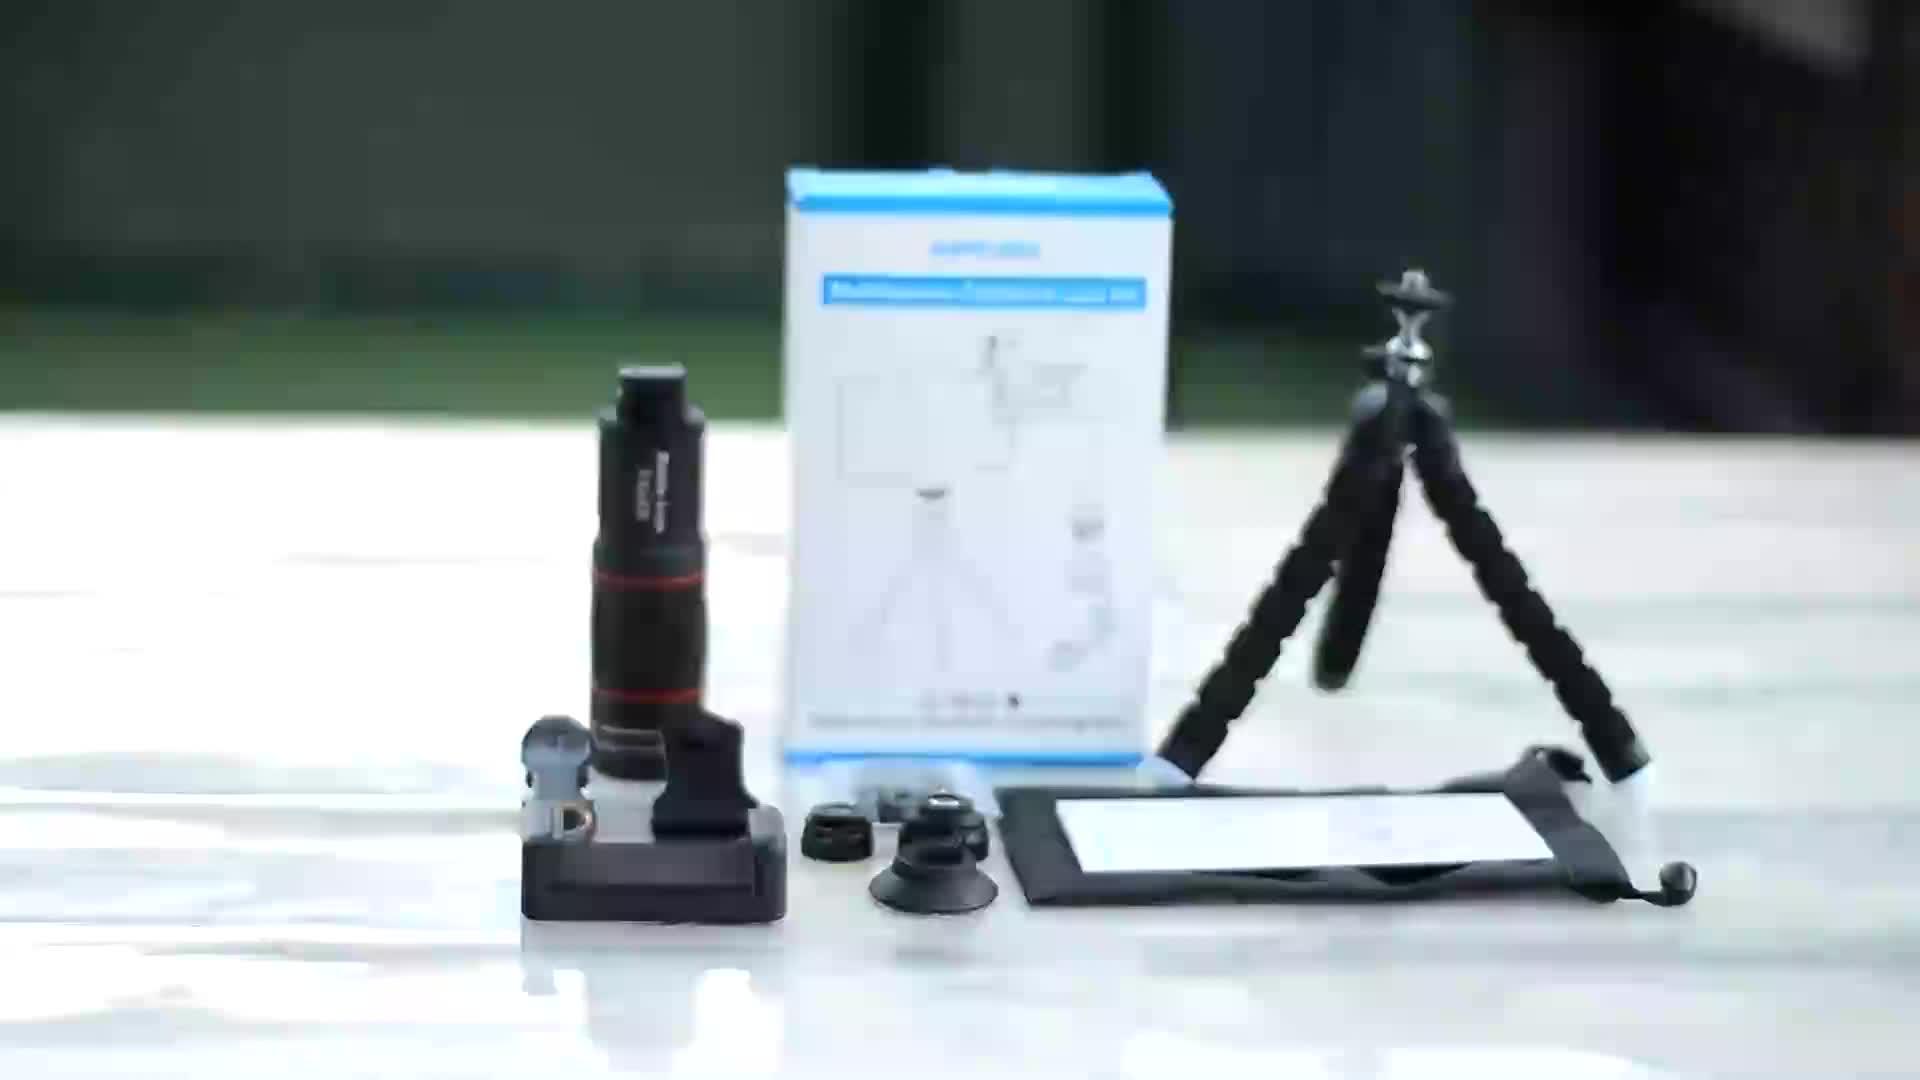 Apexel hd monocular telescope lens mobile phone telephoto zoom